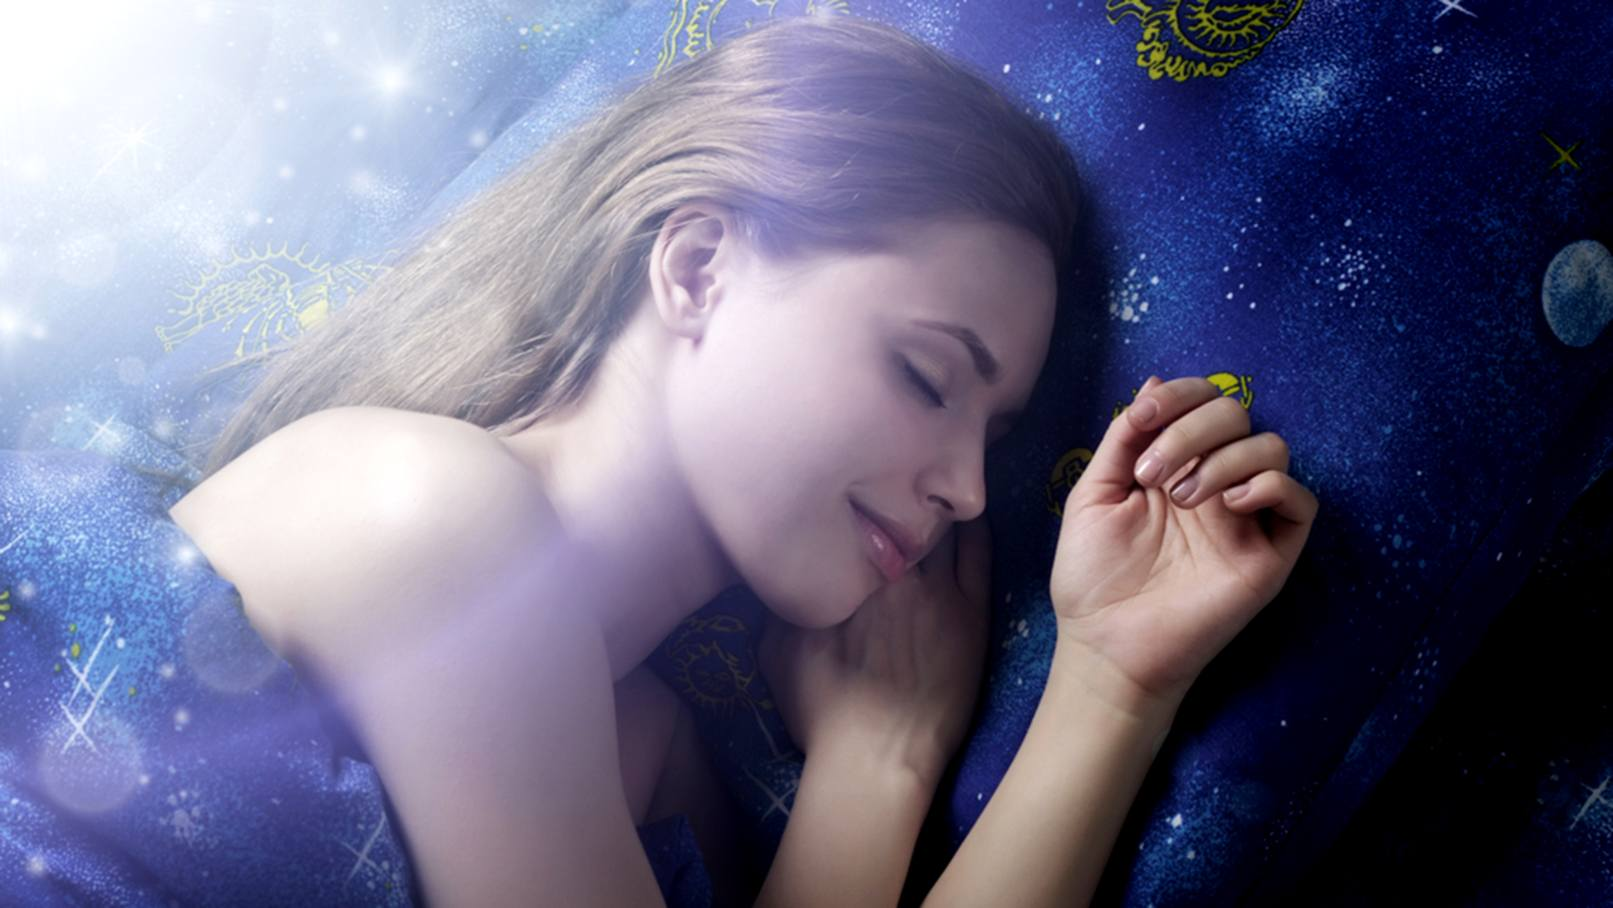 сон фотография незнакомая